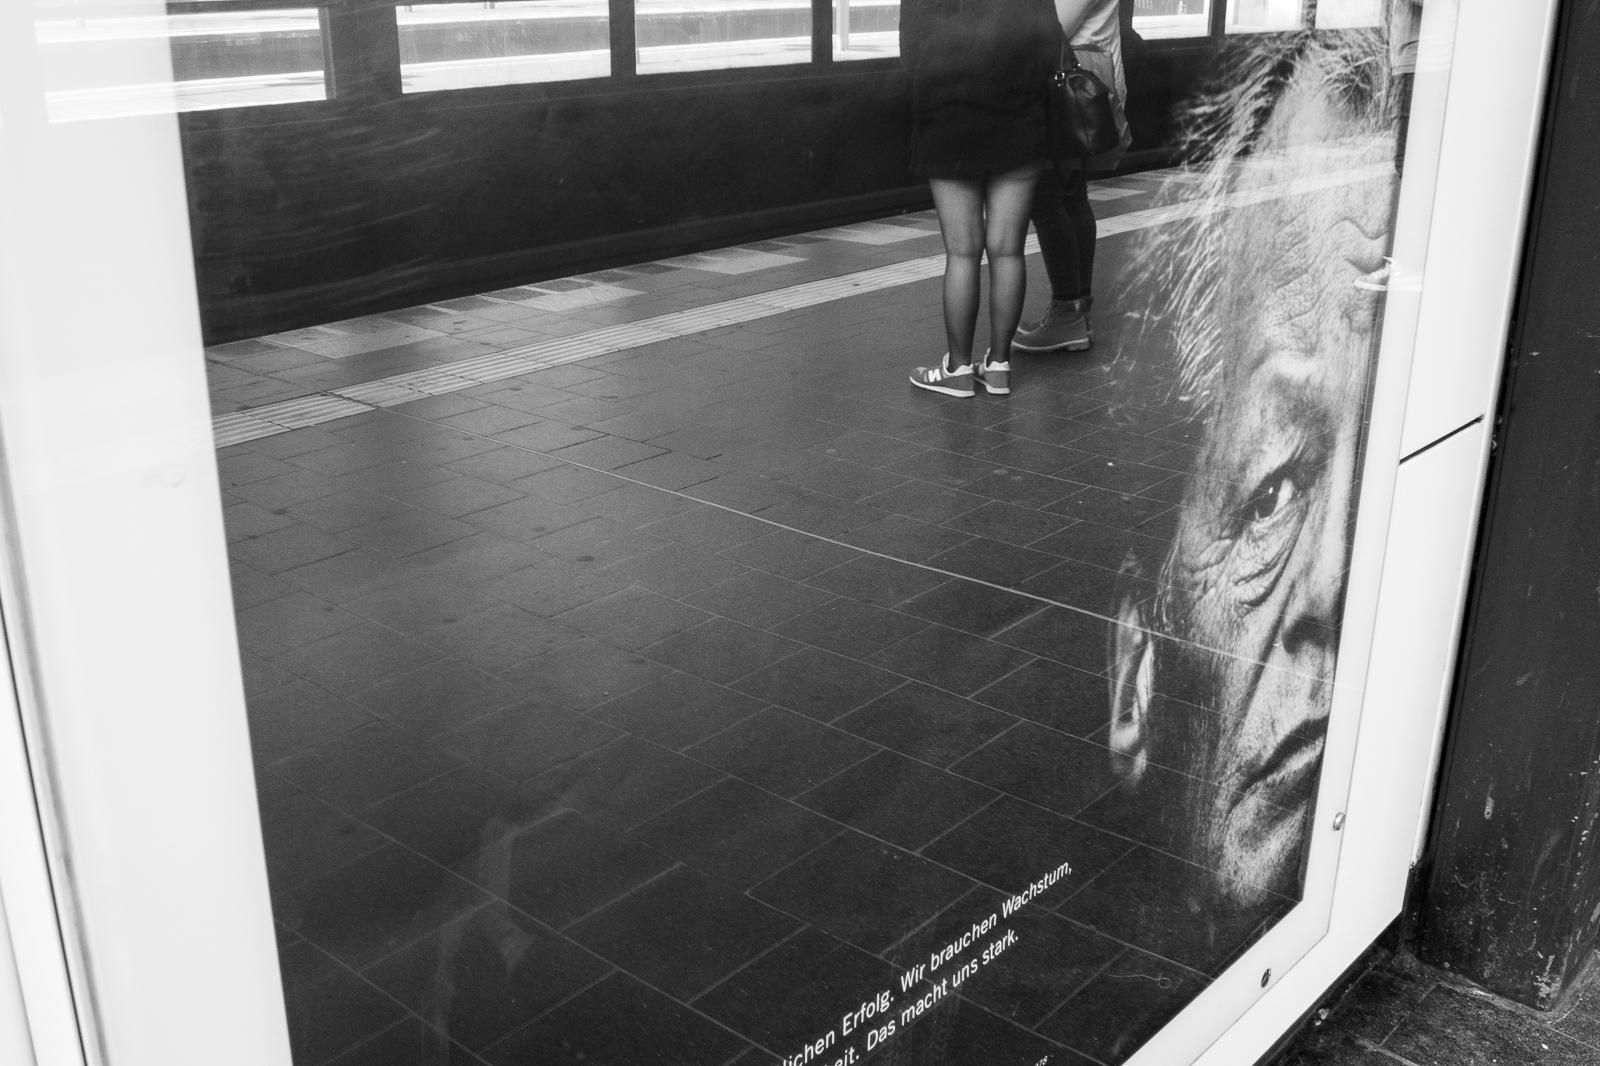 berlin_2015-1248